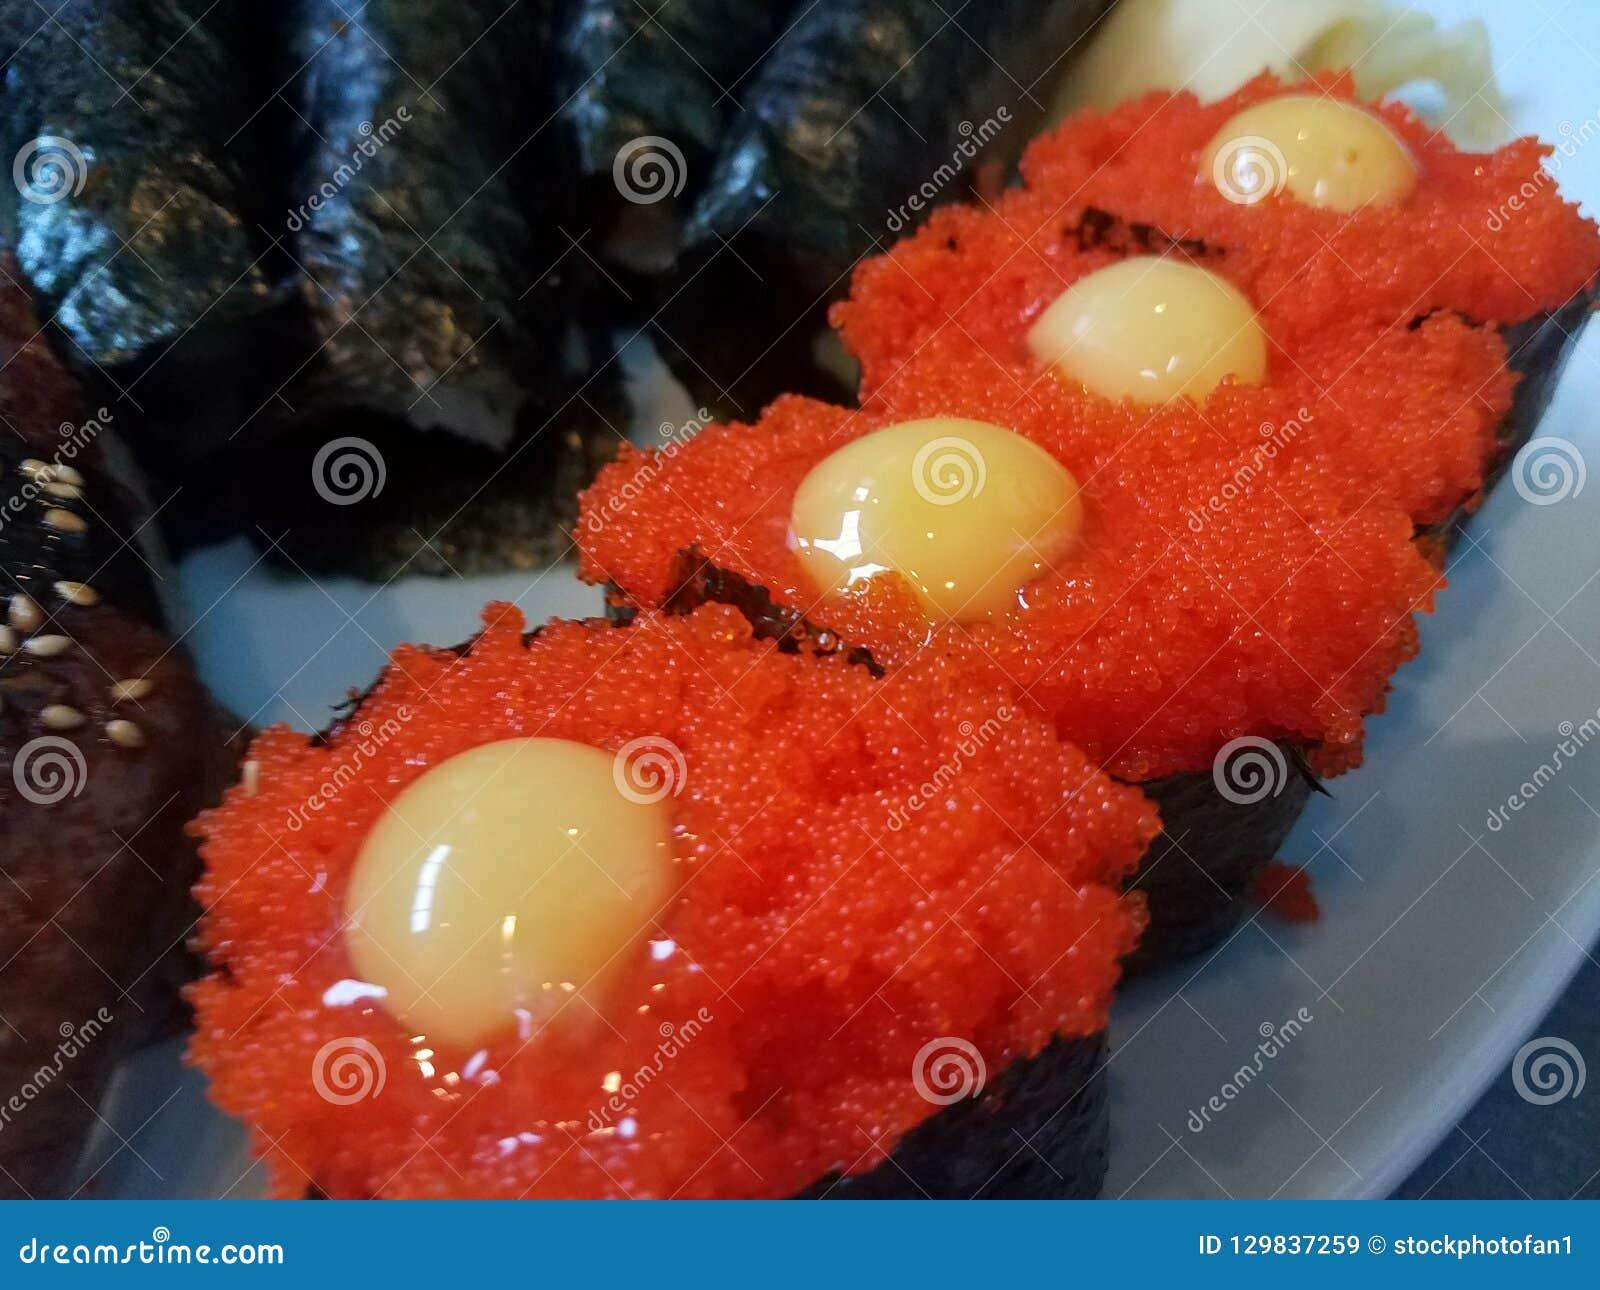 Orange Fish Eggs With Seaweed And Yellow Quail Egg Stock